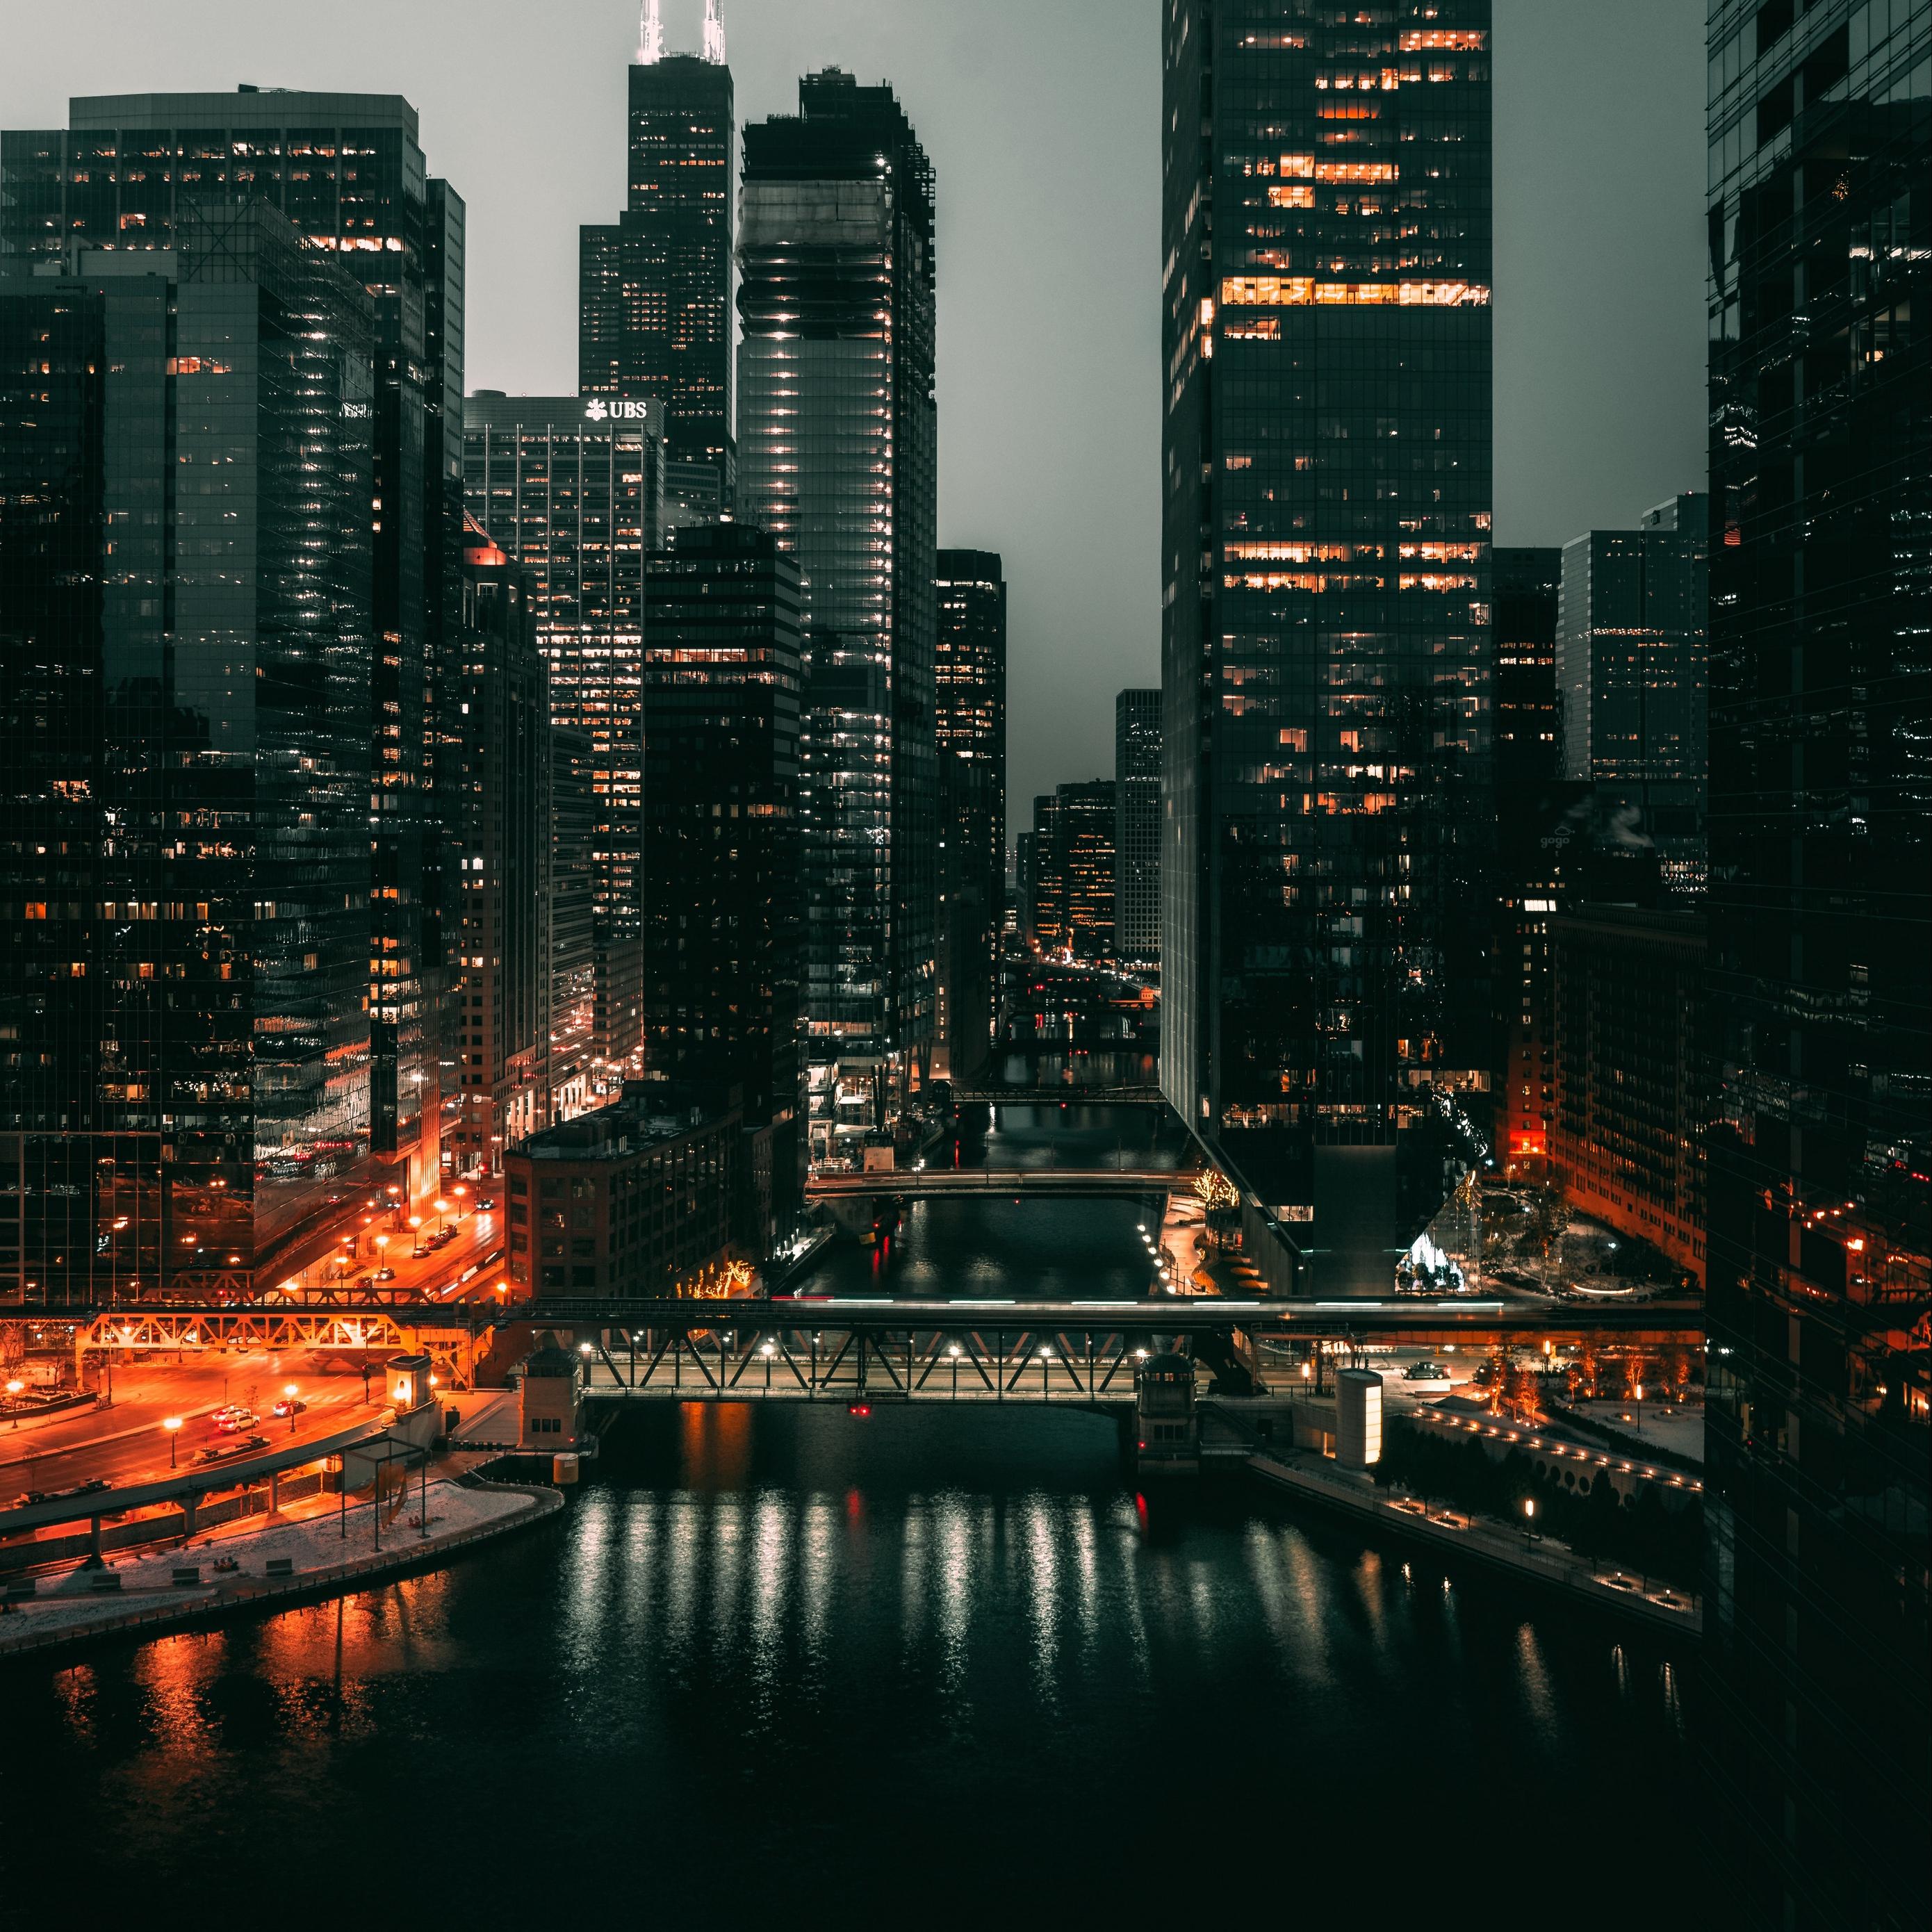 Download wallpaper 2780x2780 city metropolis aerial view 2780x2780